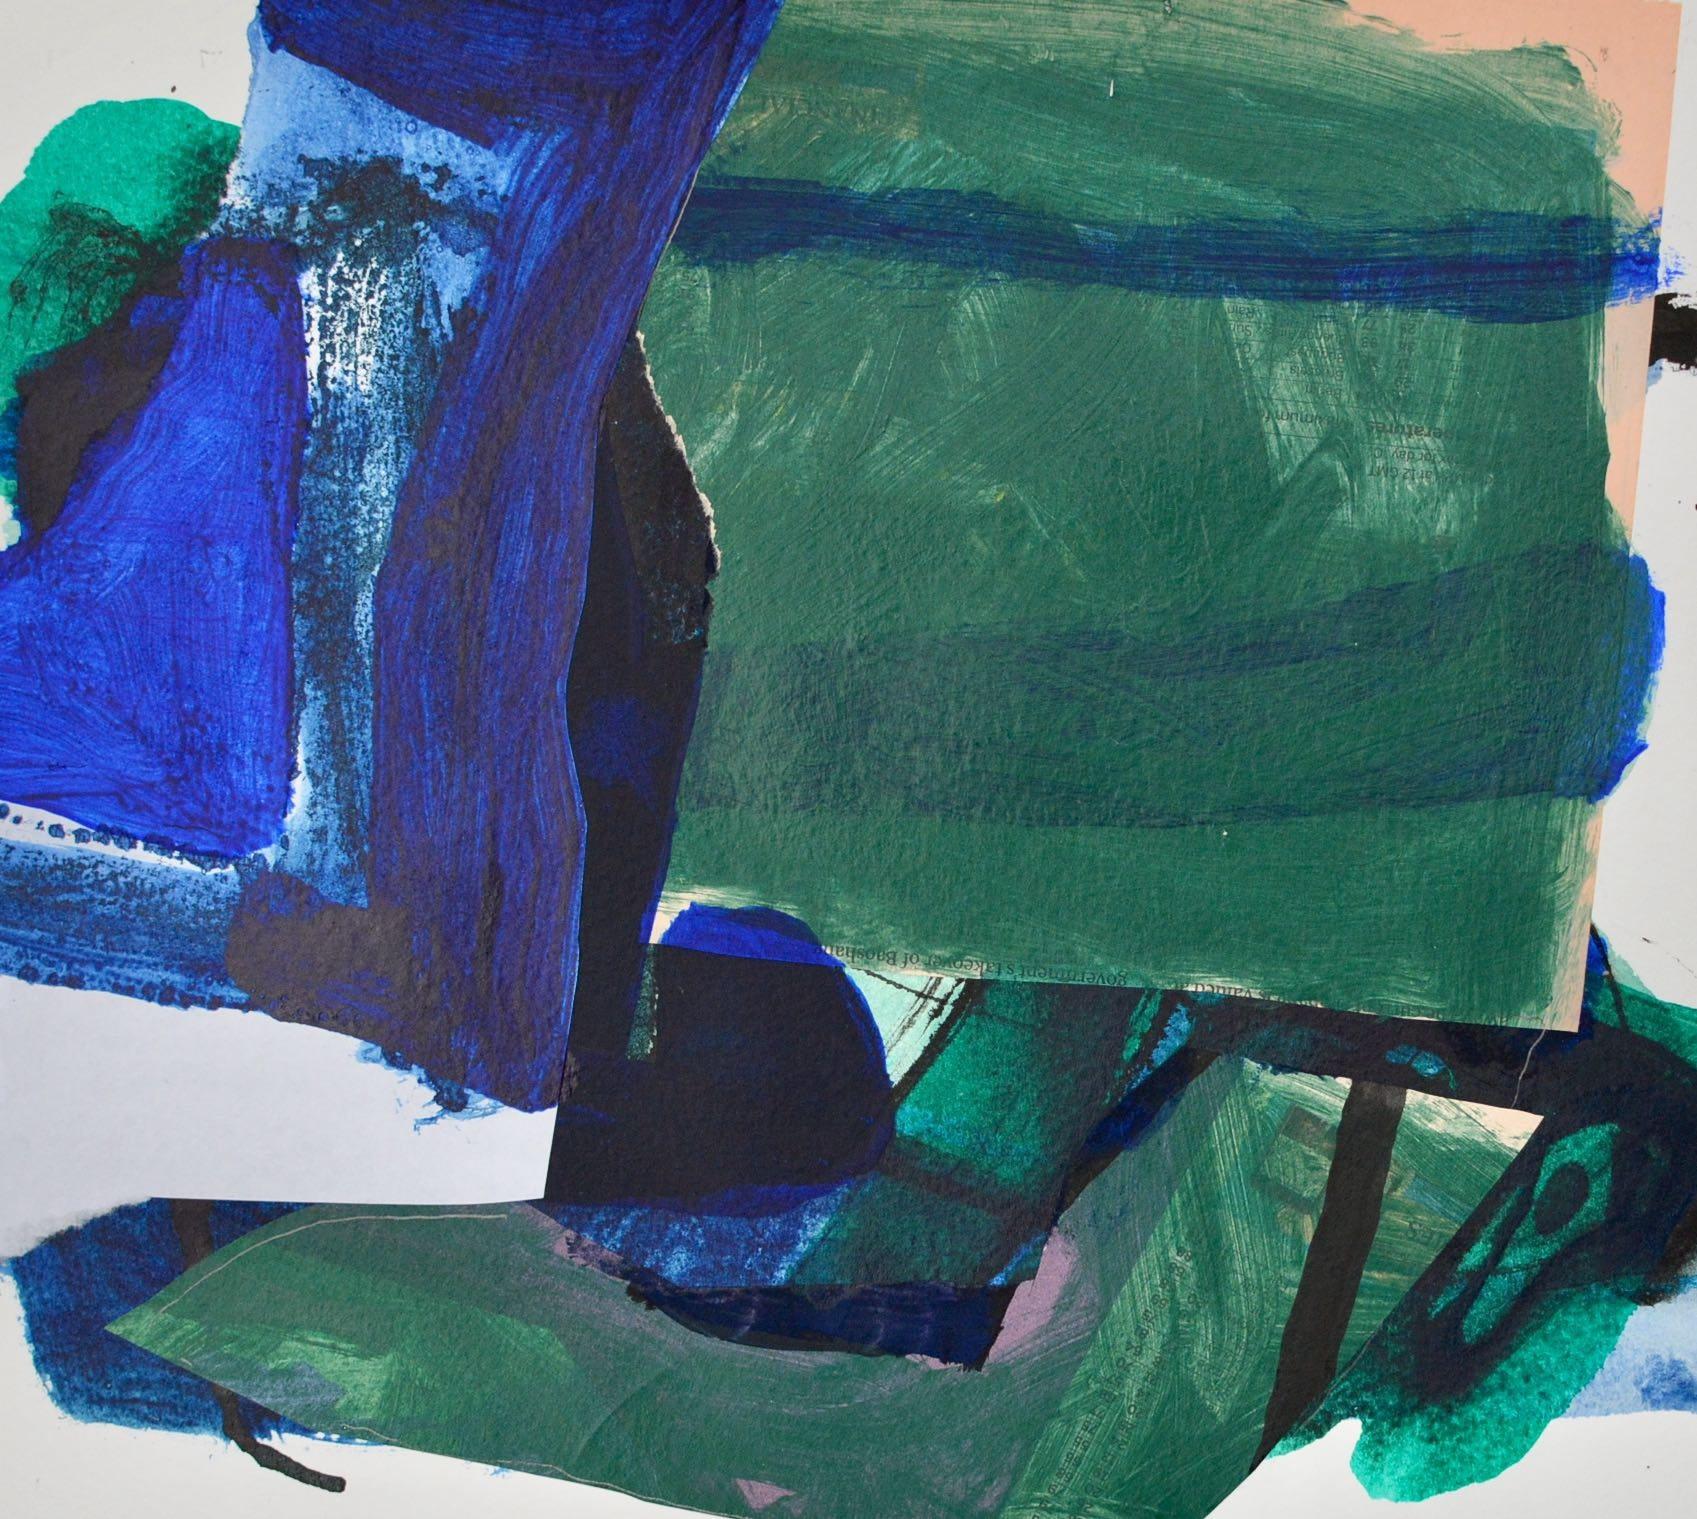 "<span class=""link fancybox-details-link""><a href=""/artists/149-jim-hunter/works/12071-jim-hunter-north-coast/"">View Detail Page</a></span><div class=""artist""><span class=""artist""><strong>Jim Hunter</strong></span></div><div class=""title""><em>North Coast</em></div><div class=""medium"">watercolour, acrylic & ink</div><div class=""dimensions"">Frame: 41 x 44 cm<br /> Artwork: 22 x 25 cm</div><div class=""price"">£550.00</div>"